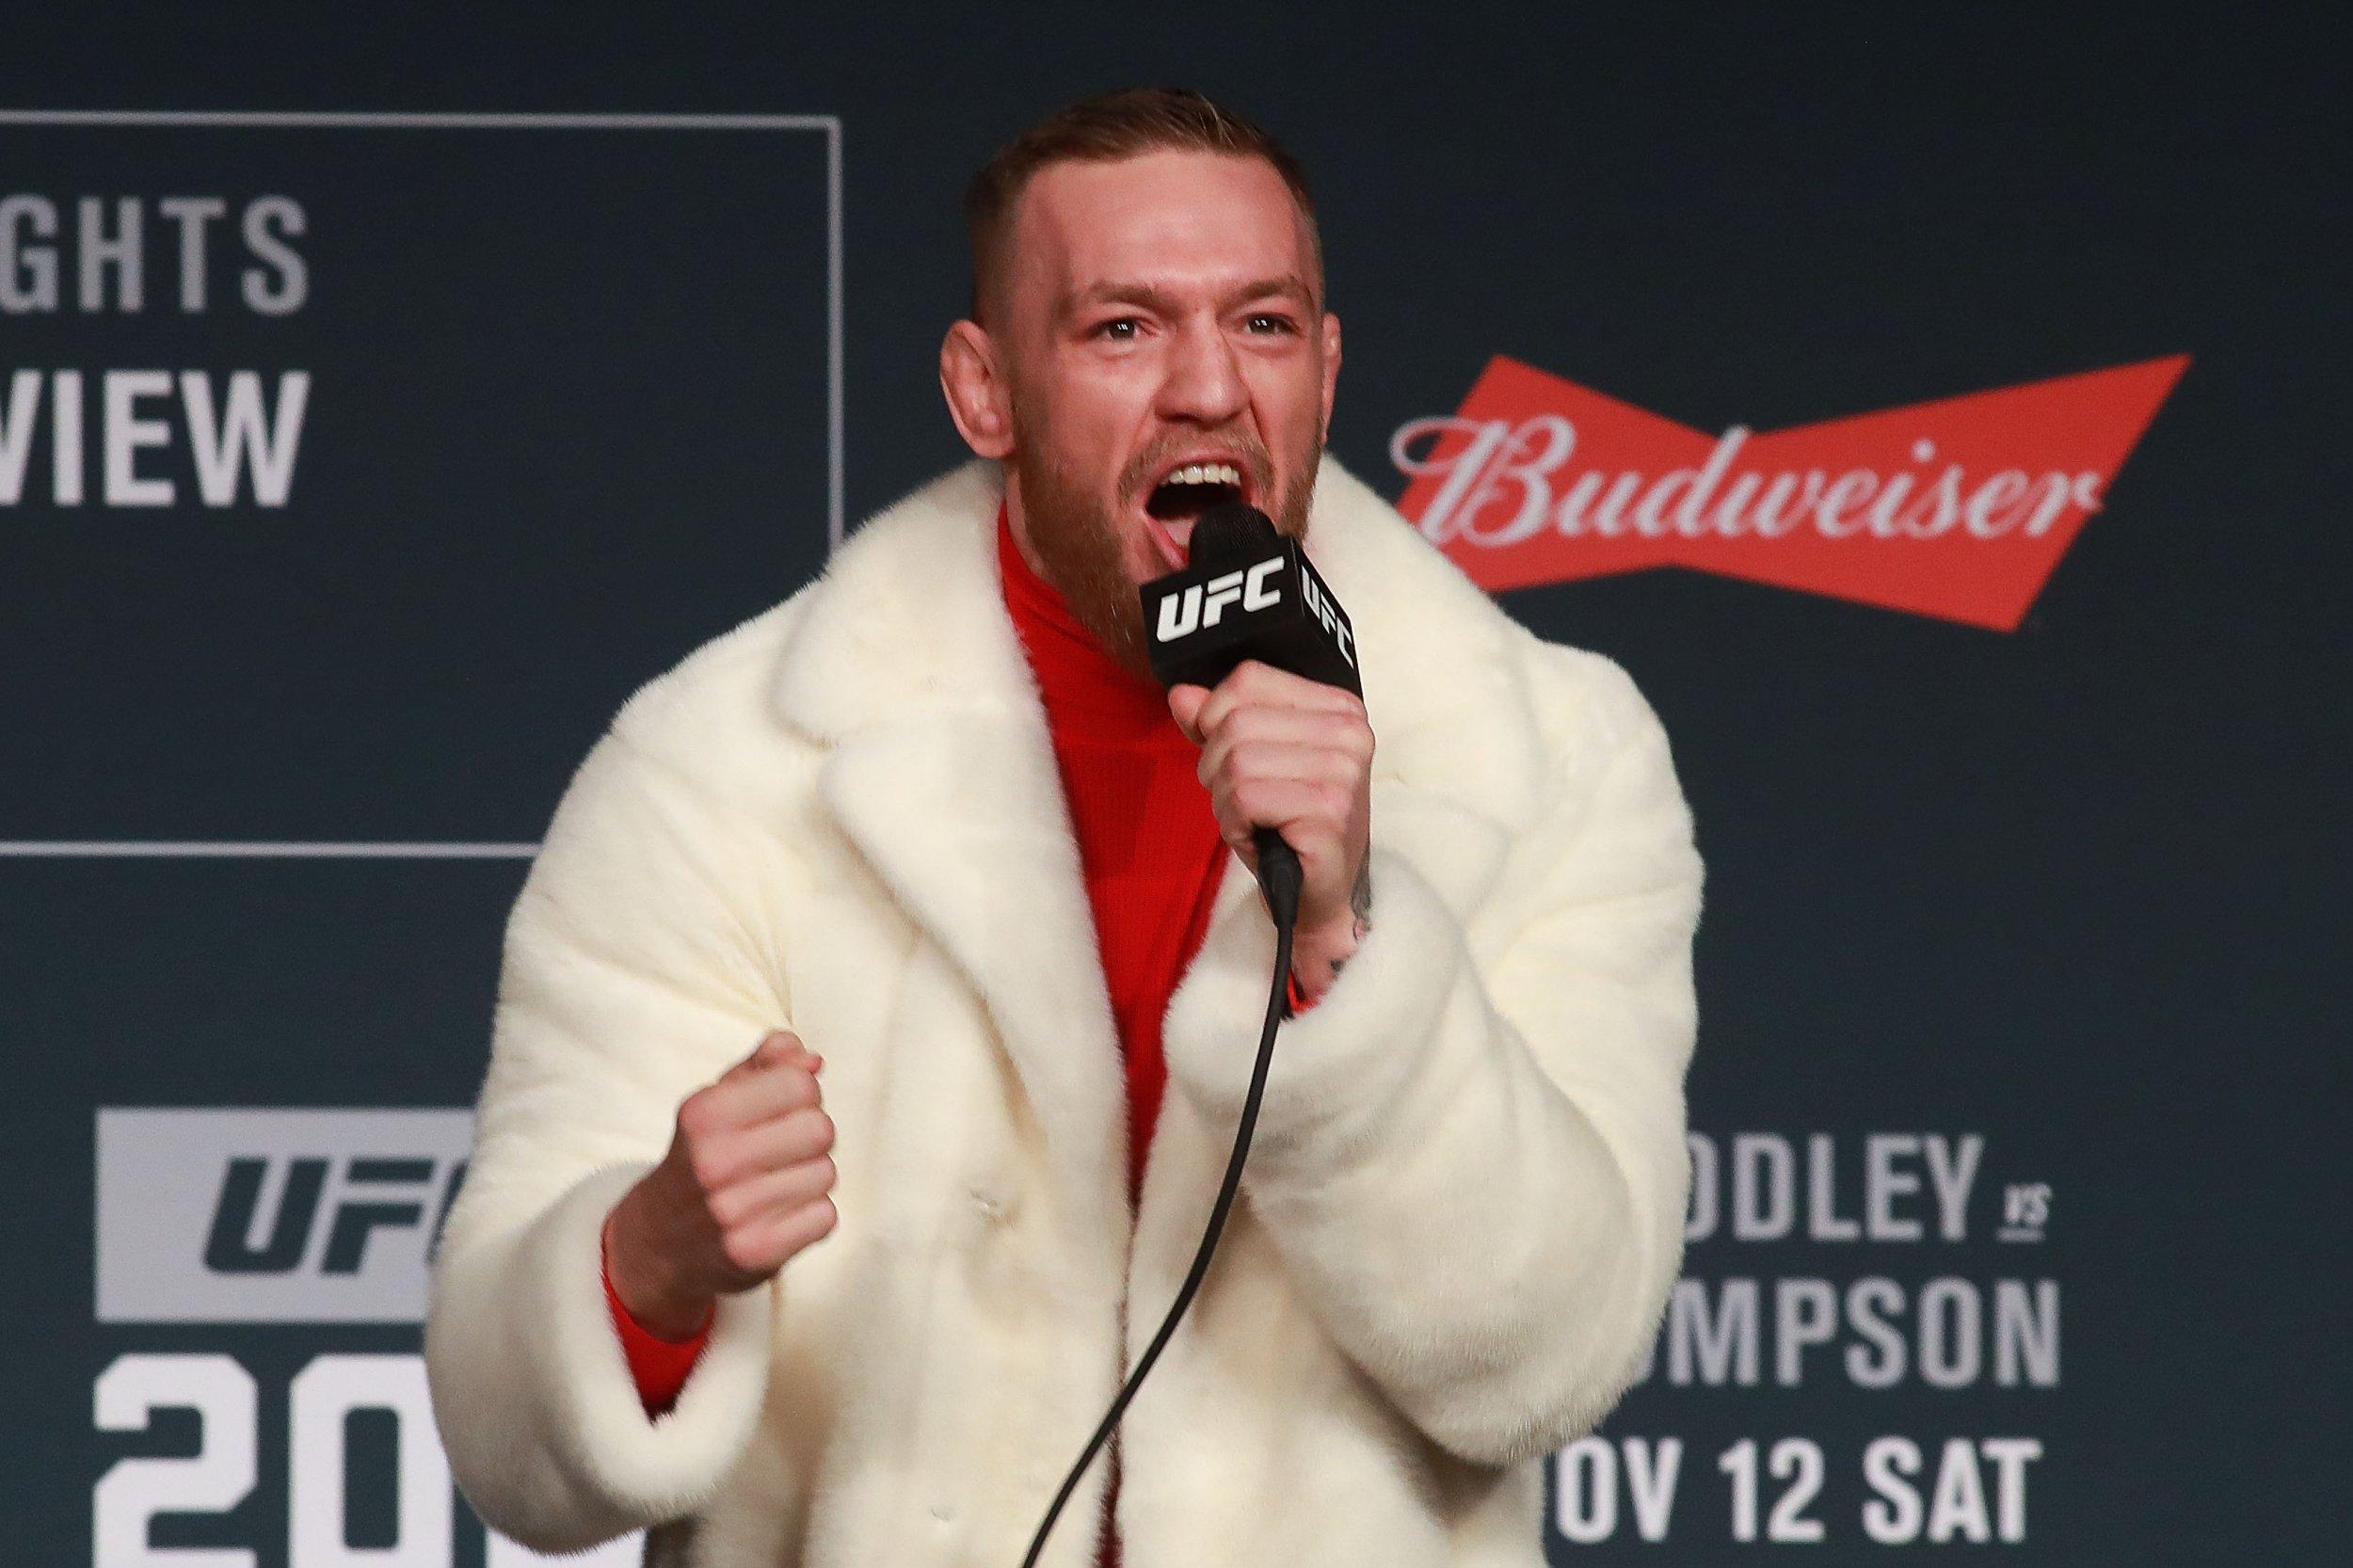 UFC lightweight champion Conor McGregor.